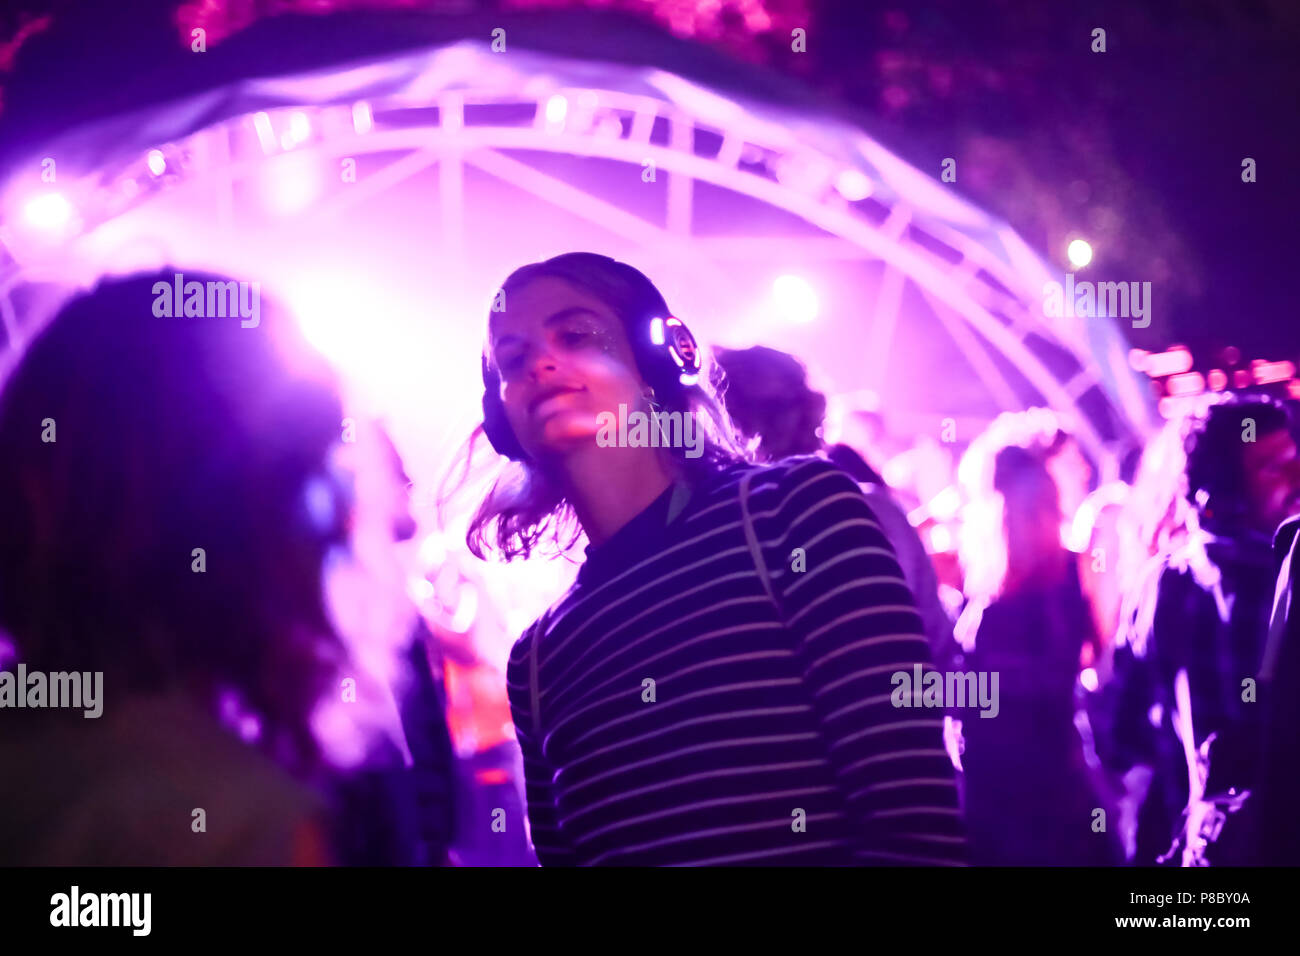 ZAGREB, KROATIEN - 26 Juni, 2018: Silent Party von YEM kolektiv DJs am 13. INmusic Festival am See Jarun in Zagreb, Kroatien. Stockbild